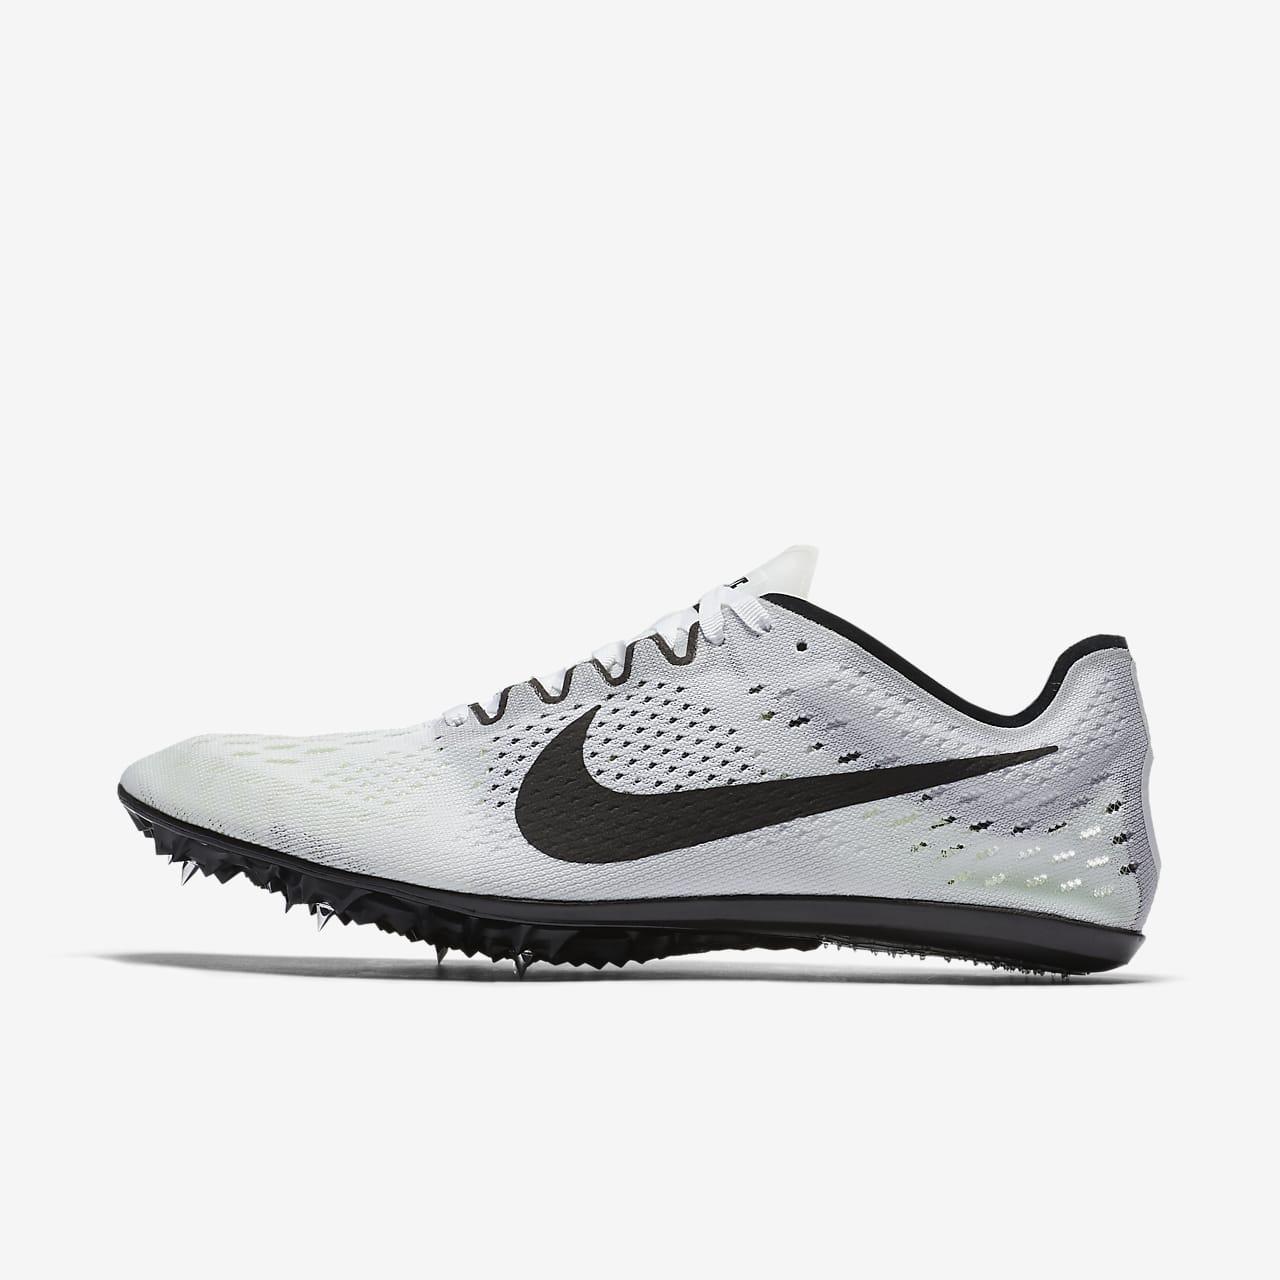 Kolce startowe Nike Zoom Victory 3